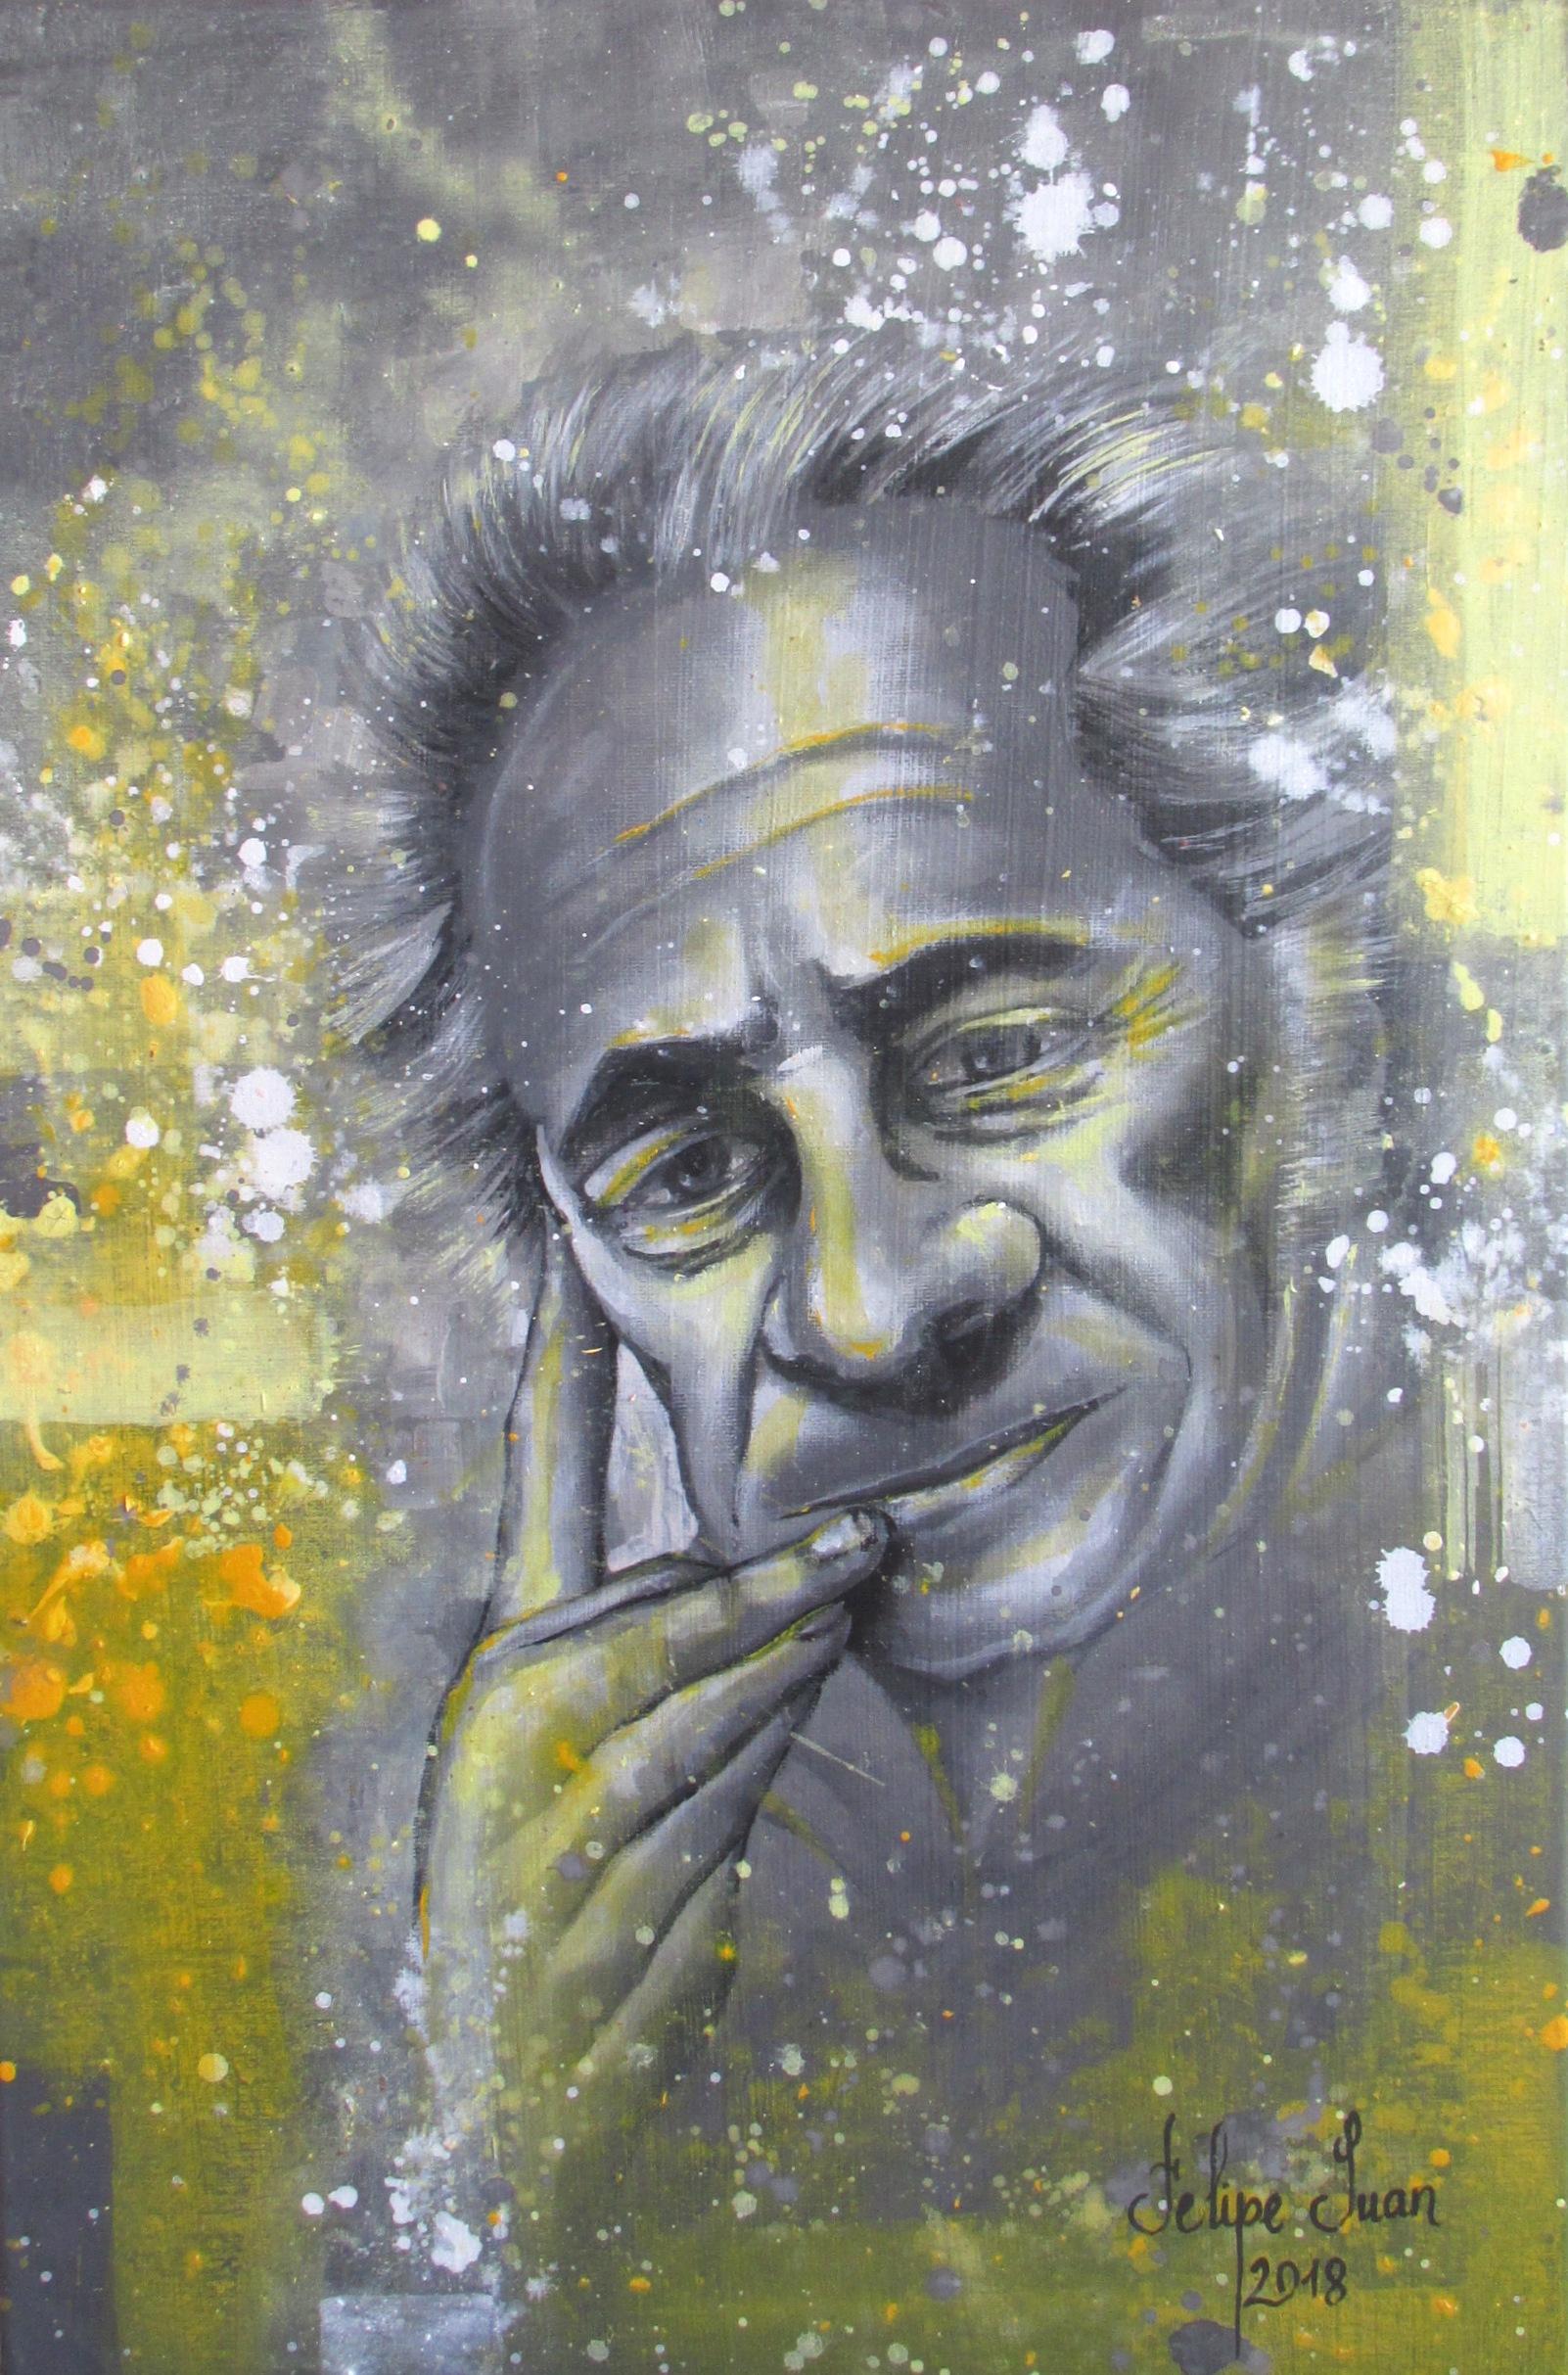 1. Nicanor Parra